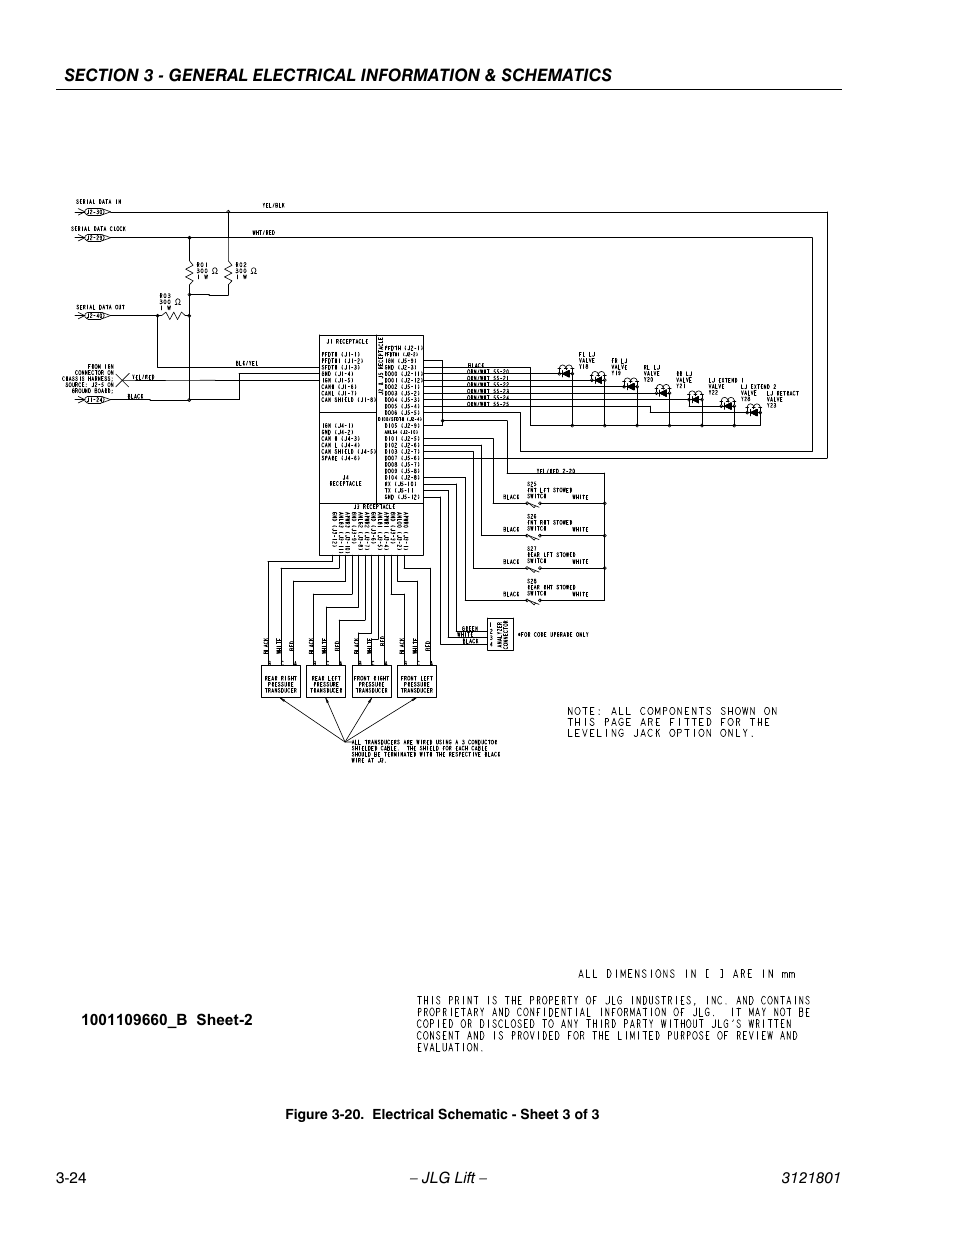 jlg 260 mrt wiring diagram wiring diagram and schematics  electrical schematic sheet 3 of 3 24 jlg 260mrt service manual user manual